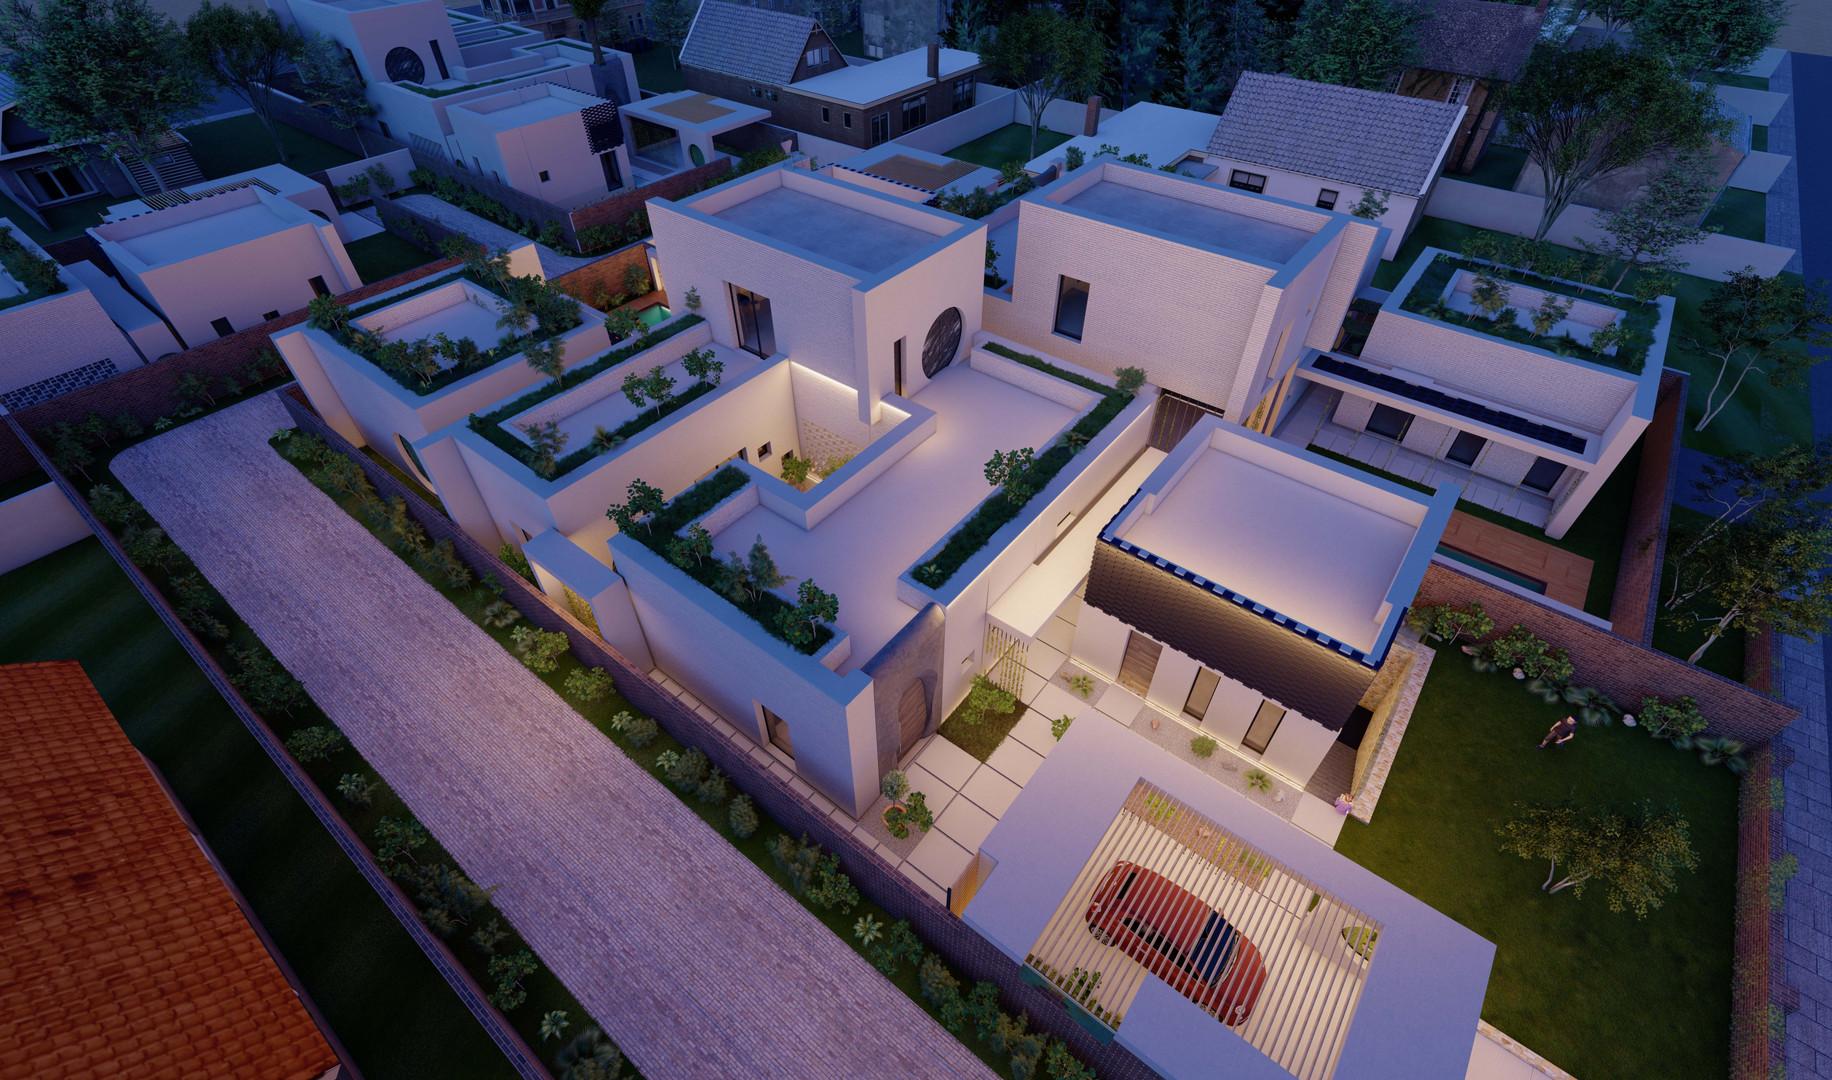 4 Houses_Night